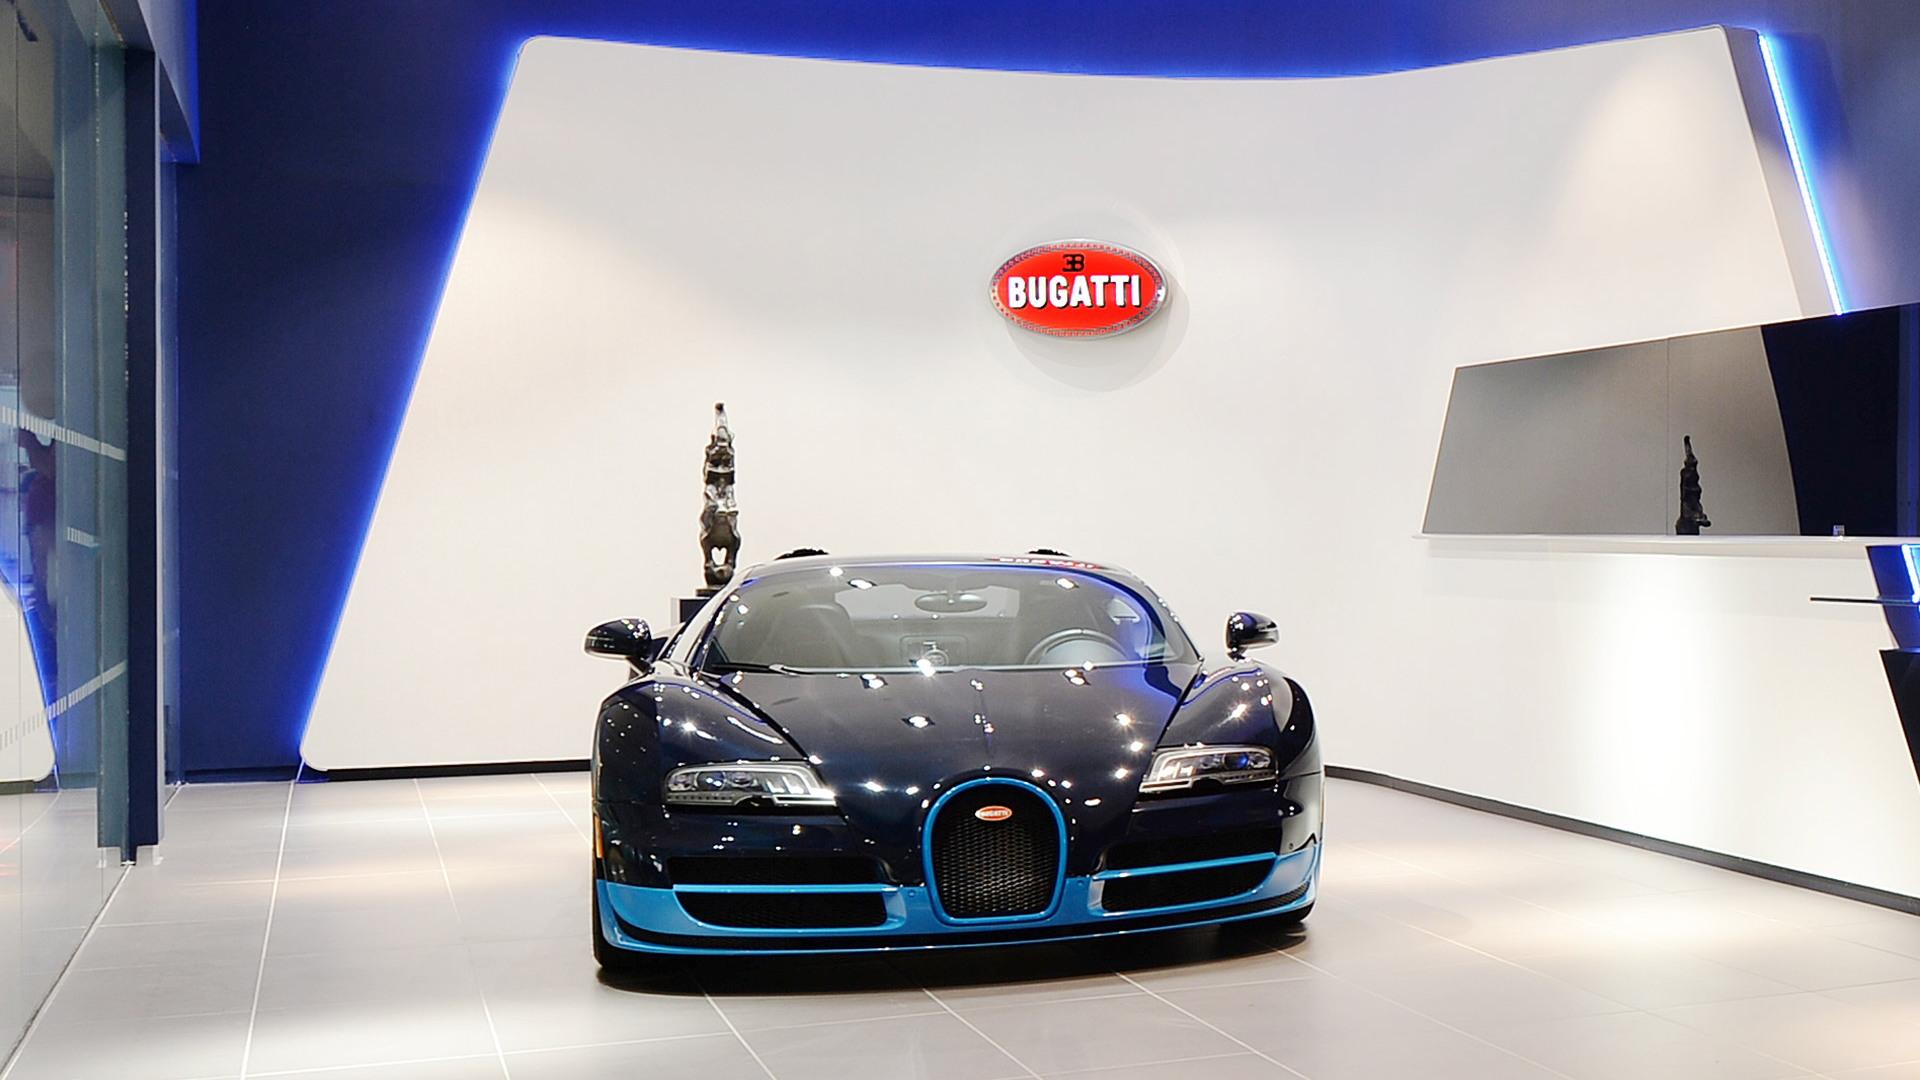 Bugatti showroom in New York City